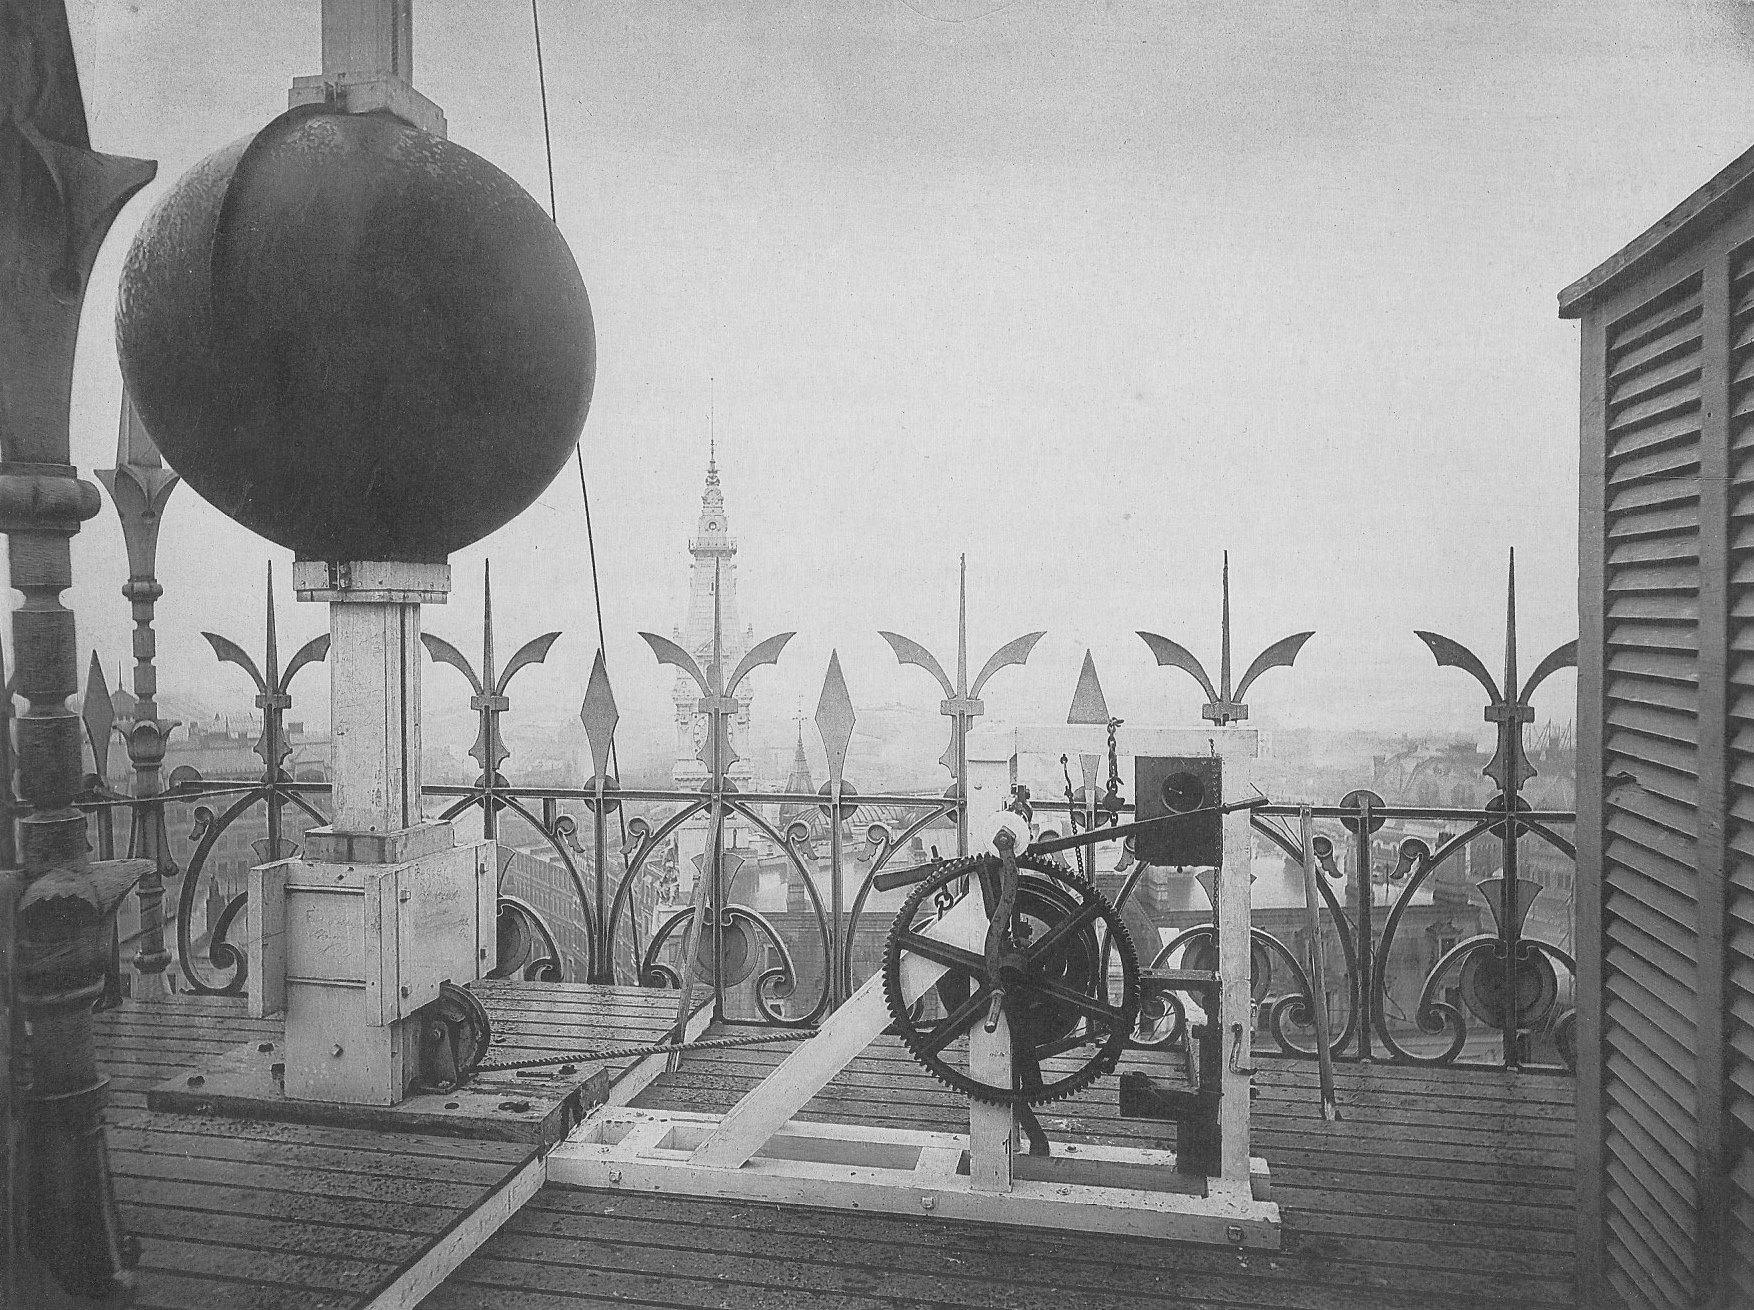 1881 Boston time ball